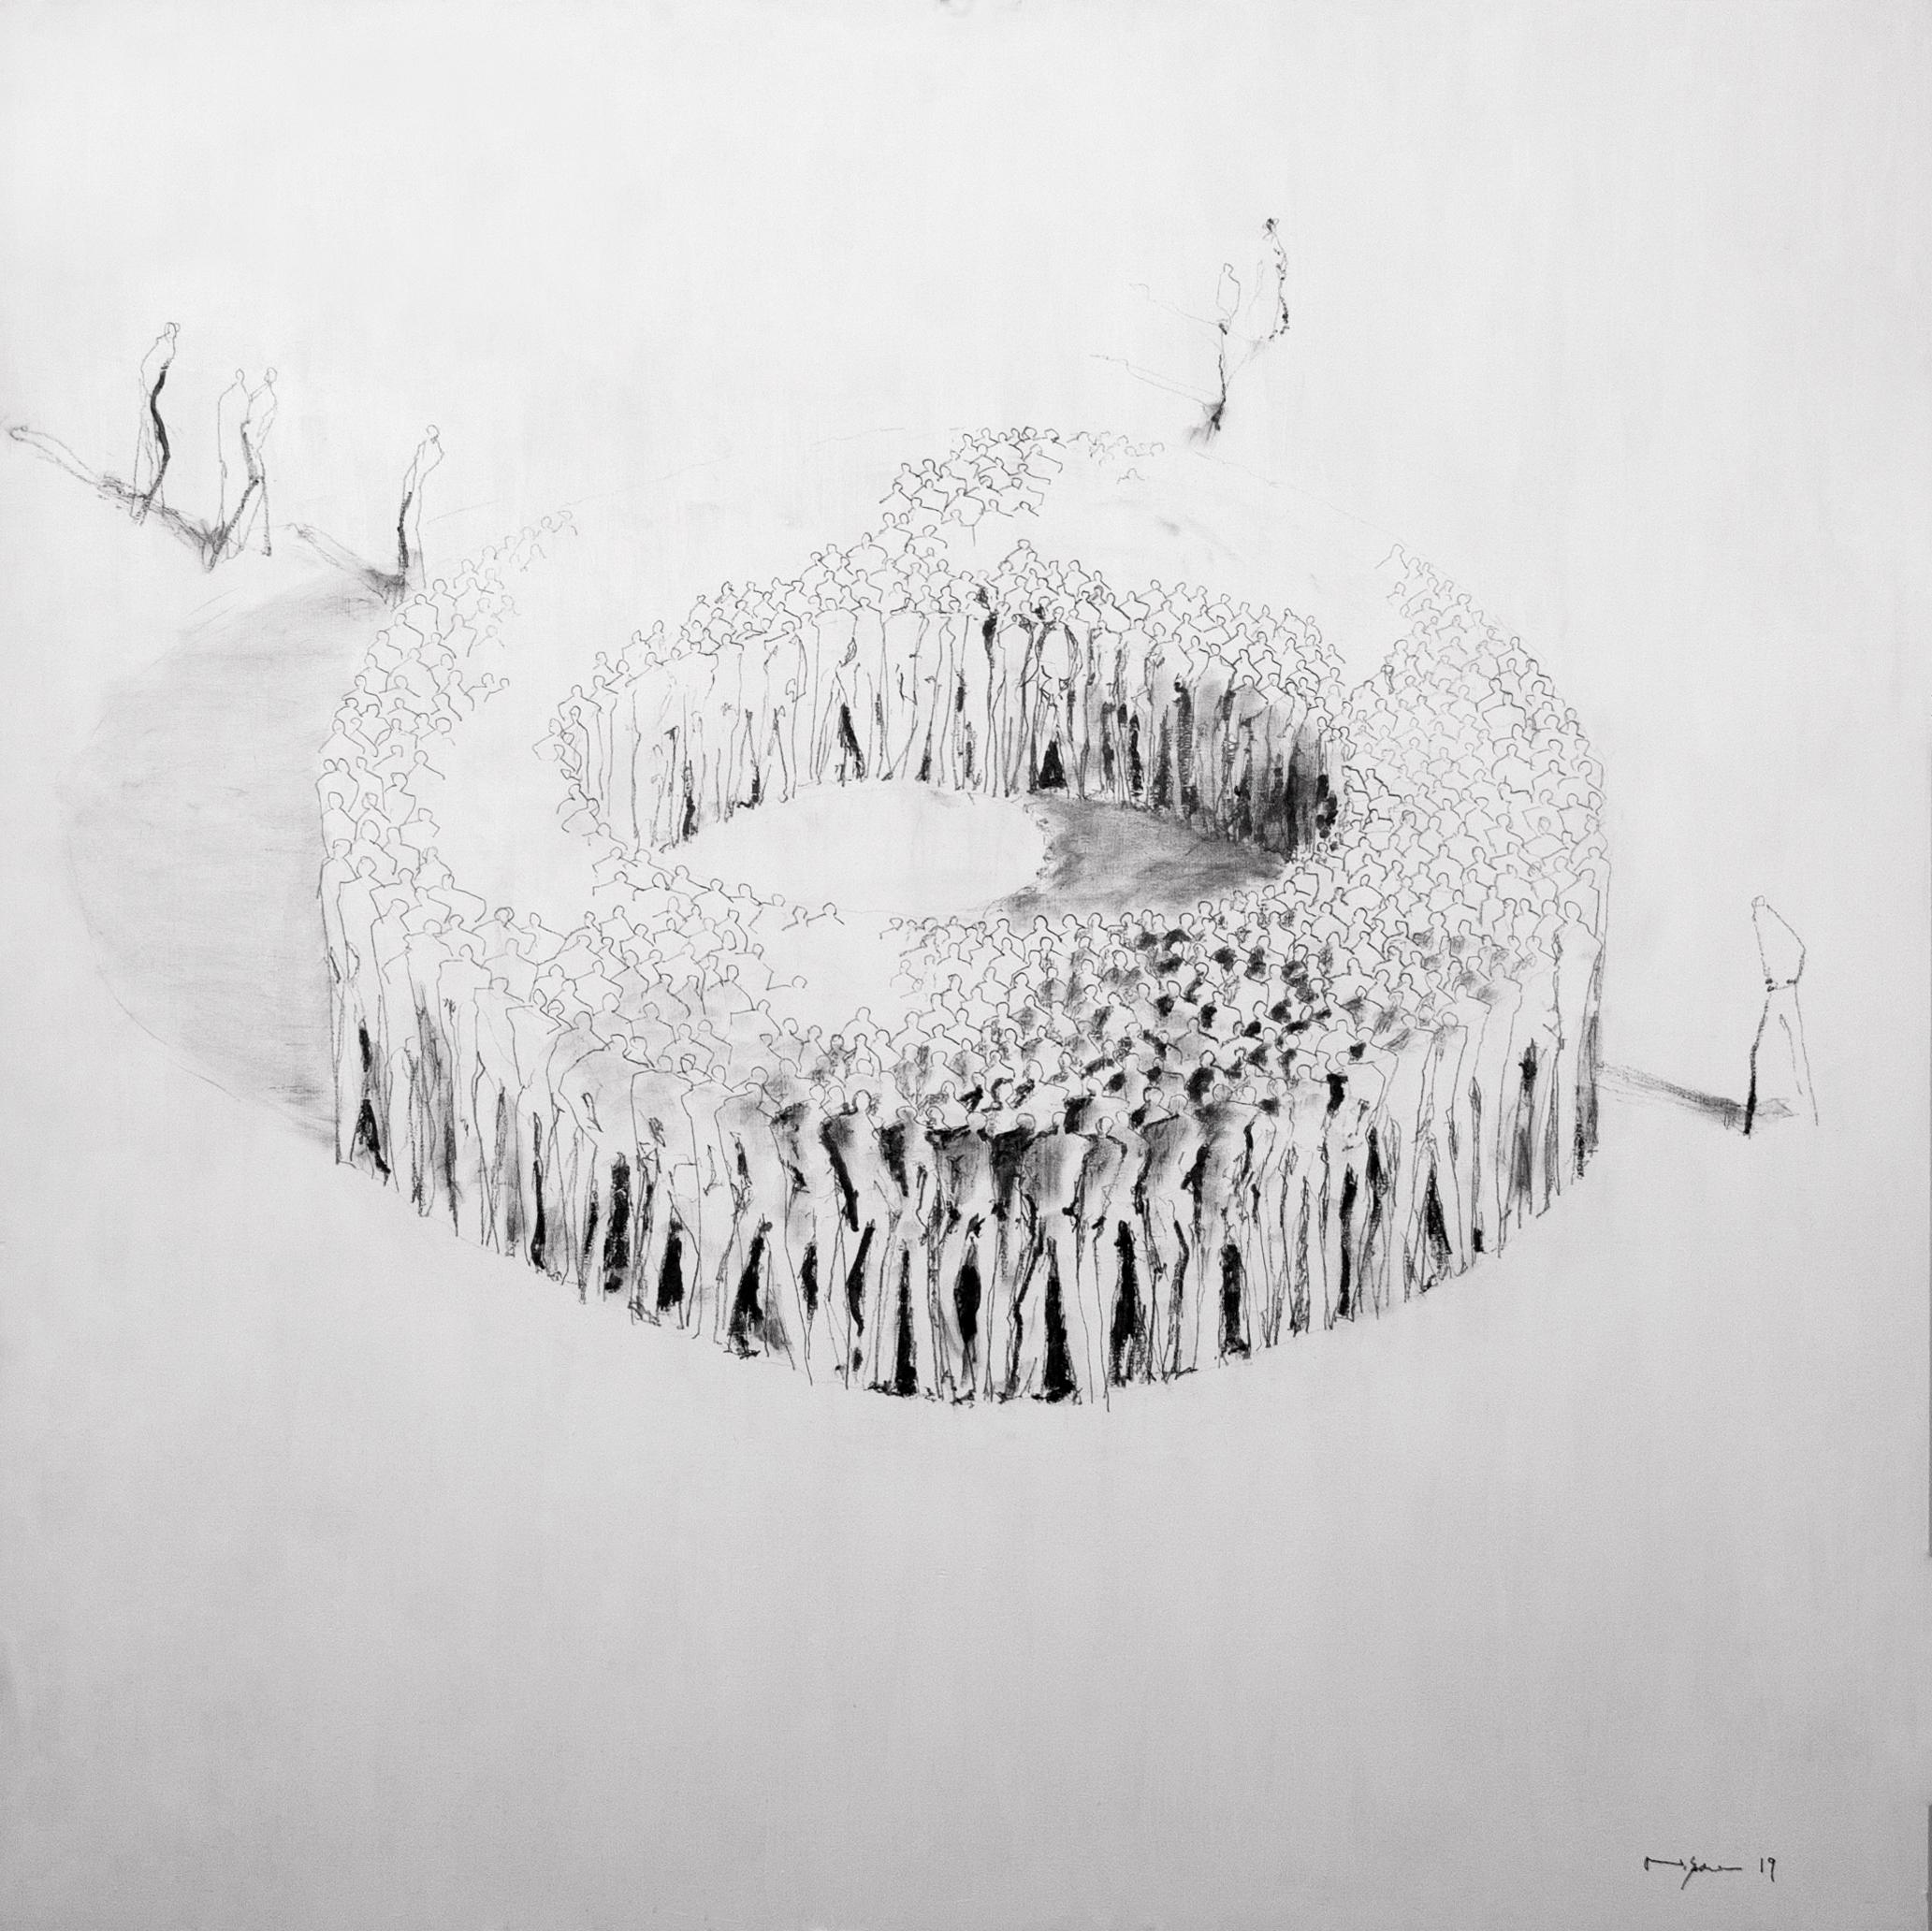 Heinz P. Nitzsche - Consilium Skizze, 2019 | Unikat | signiert | Acryl & Graphit auf Holztafel | 100 x 100 cm